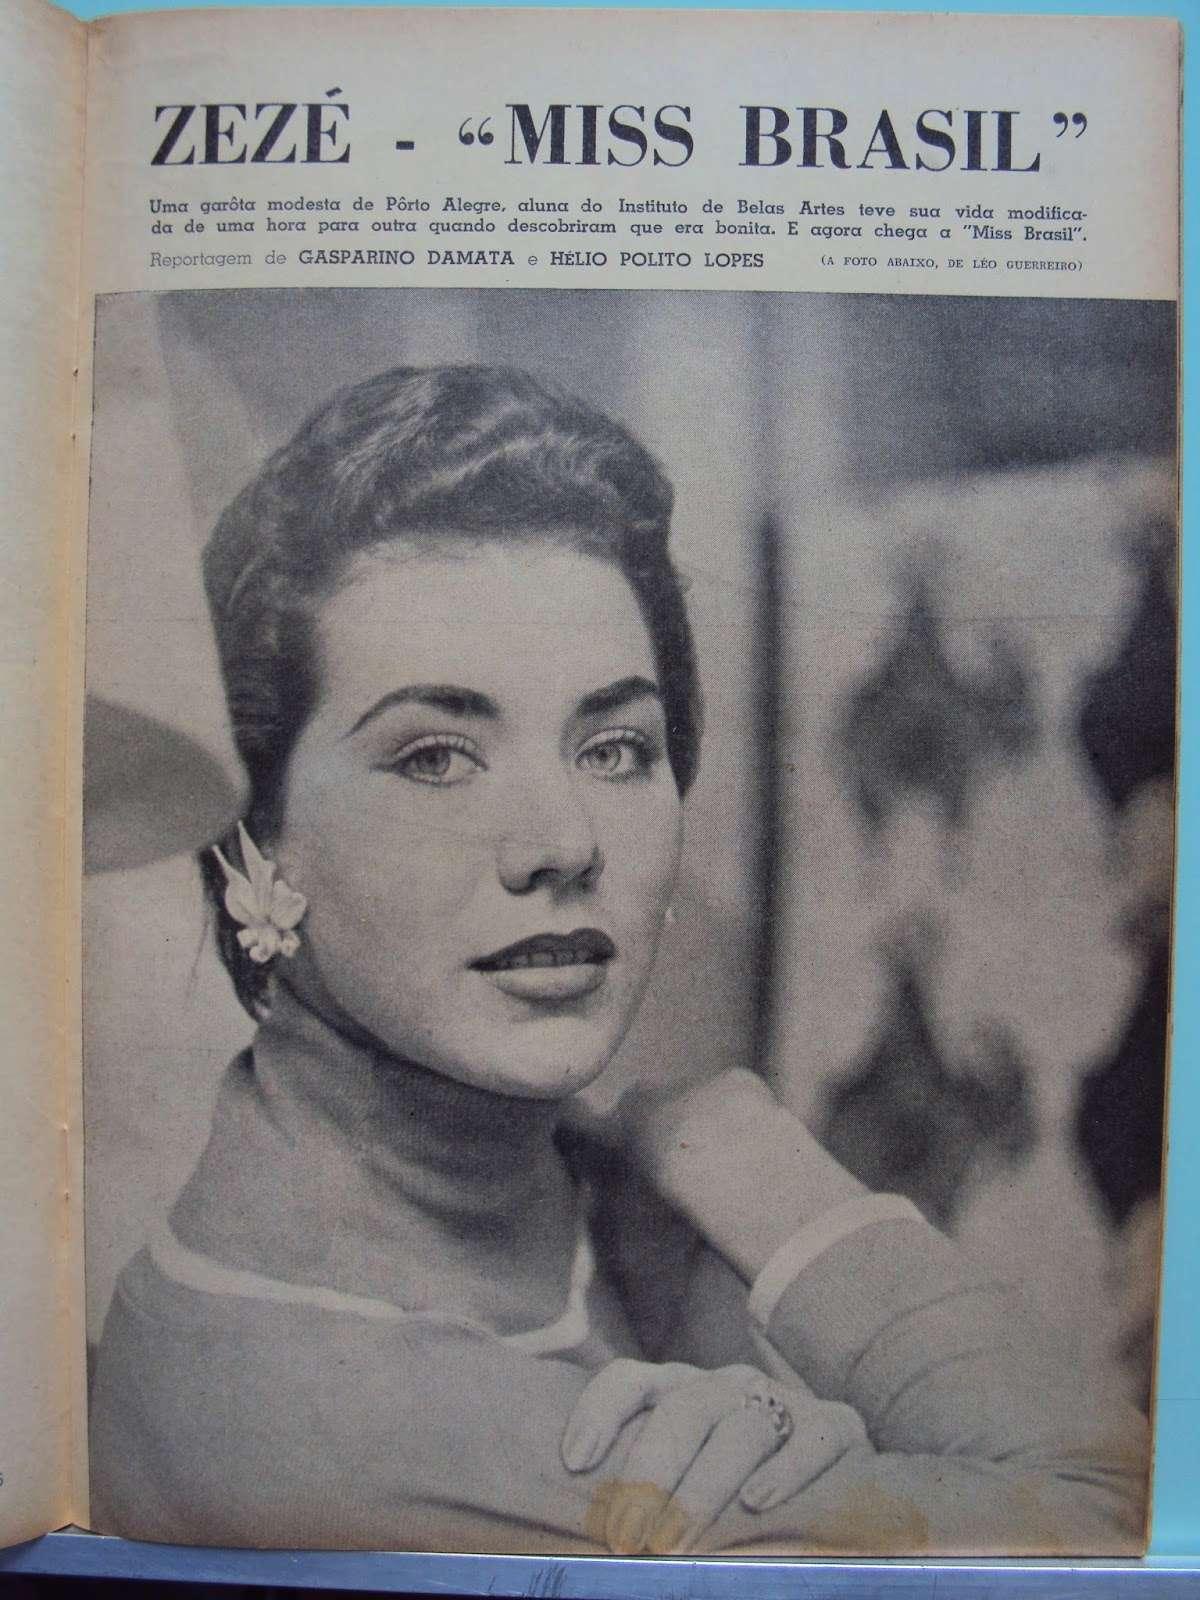 maria jose cardoso, semifinalista de miss universe 1956. 42f65210